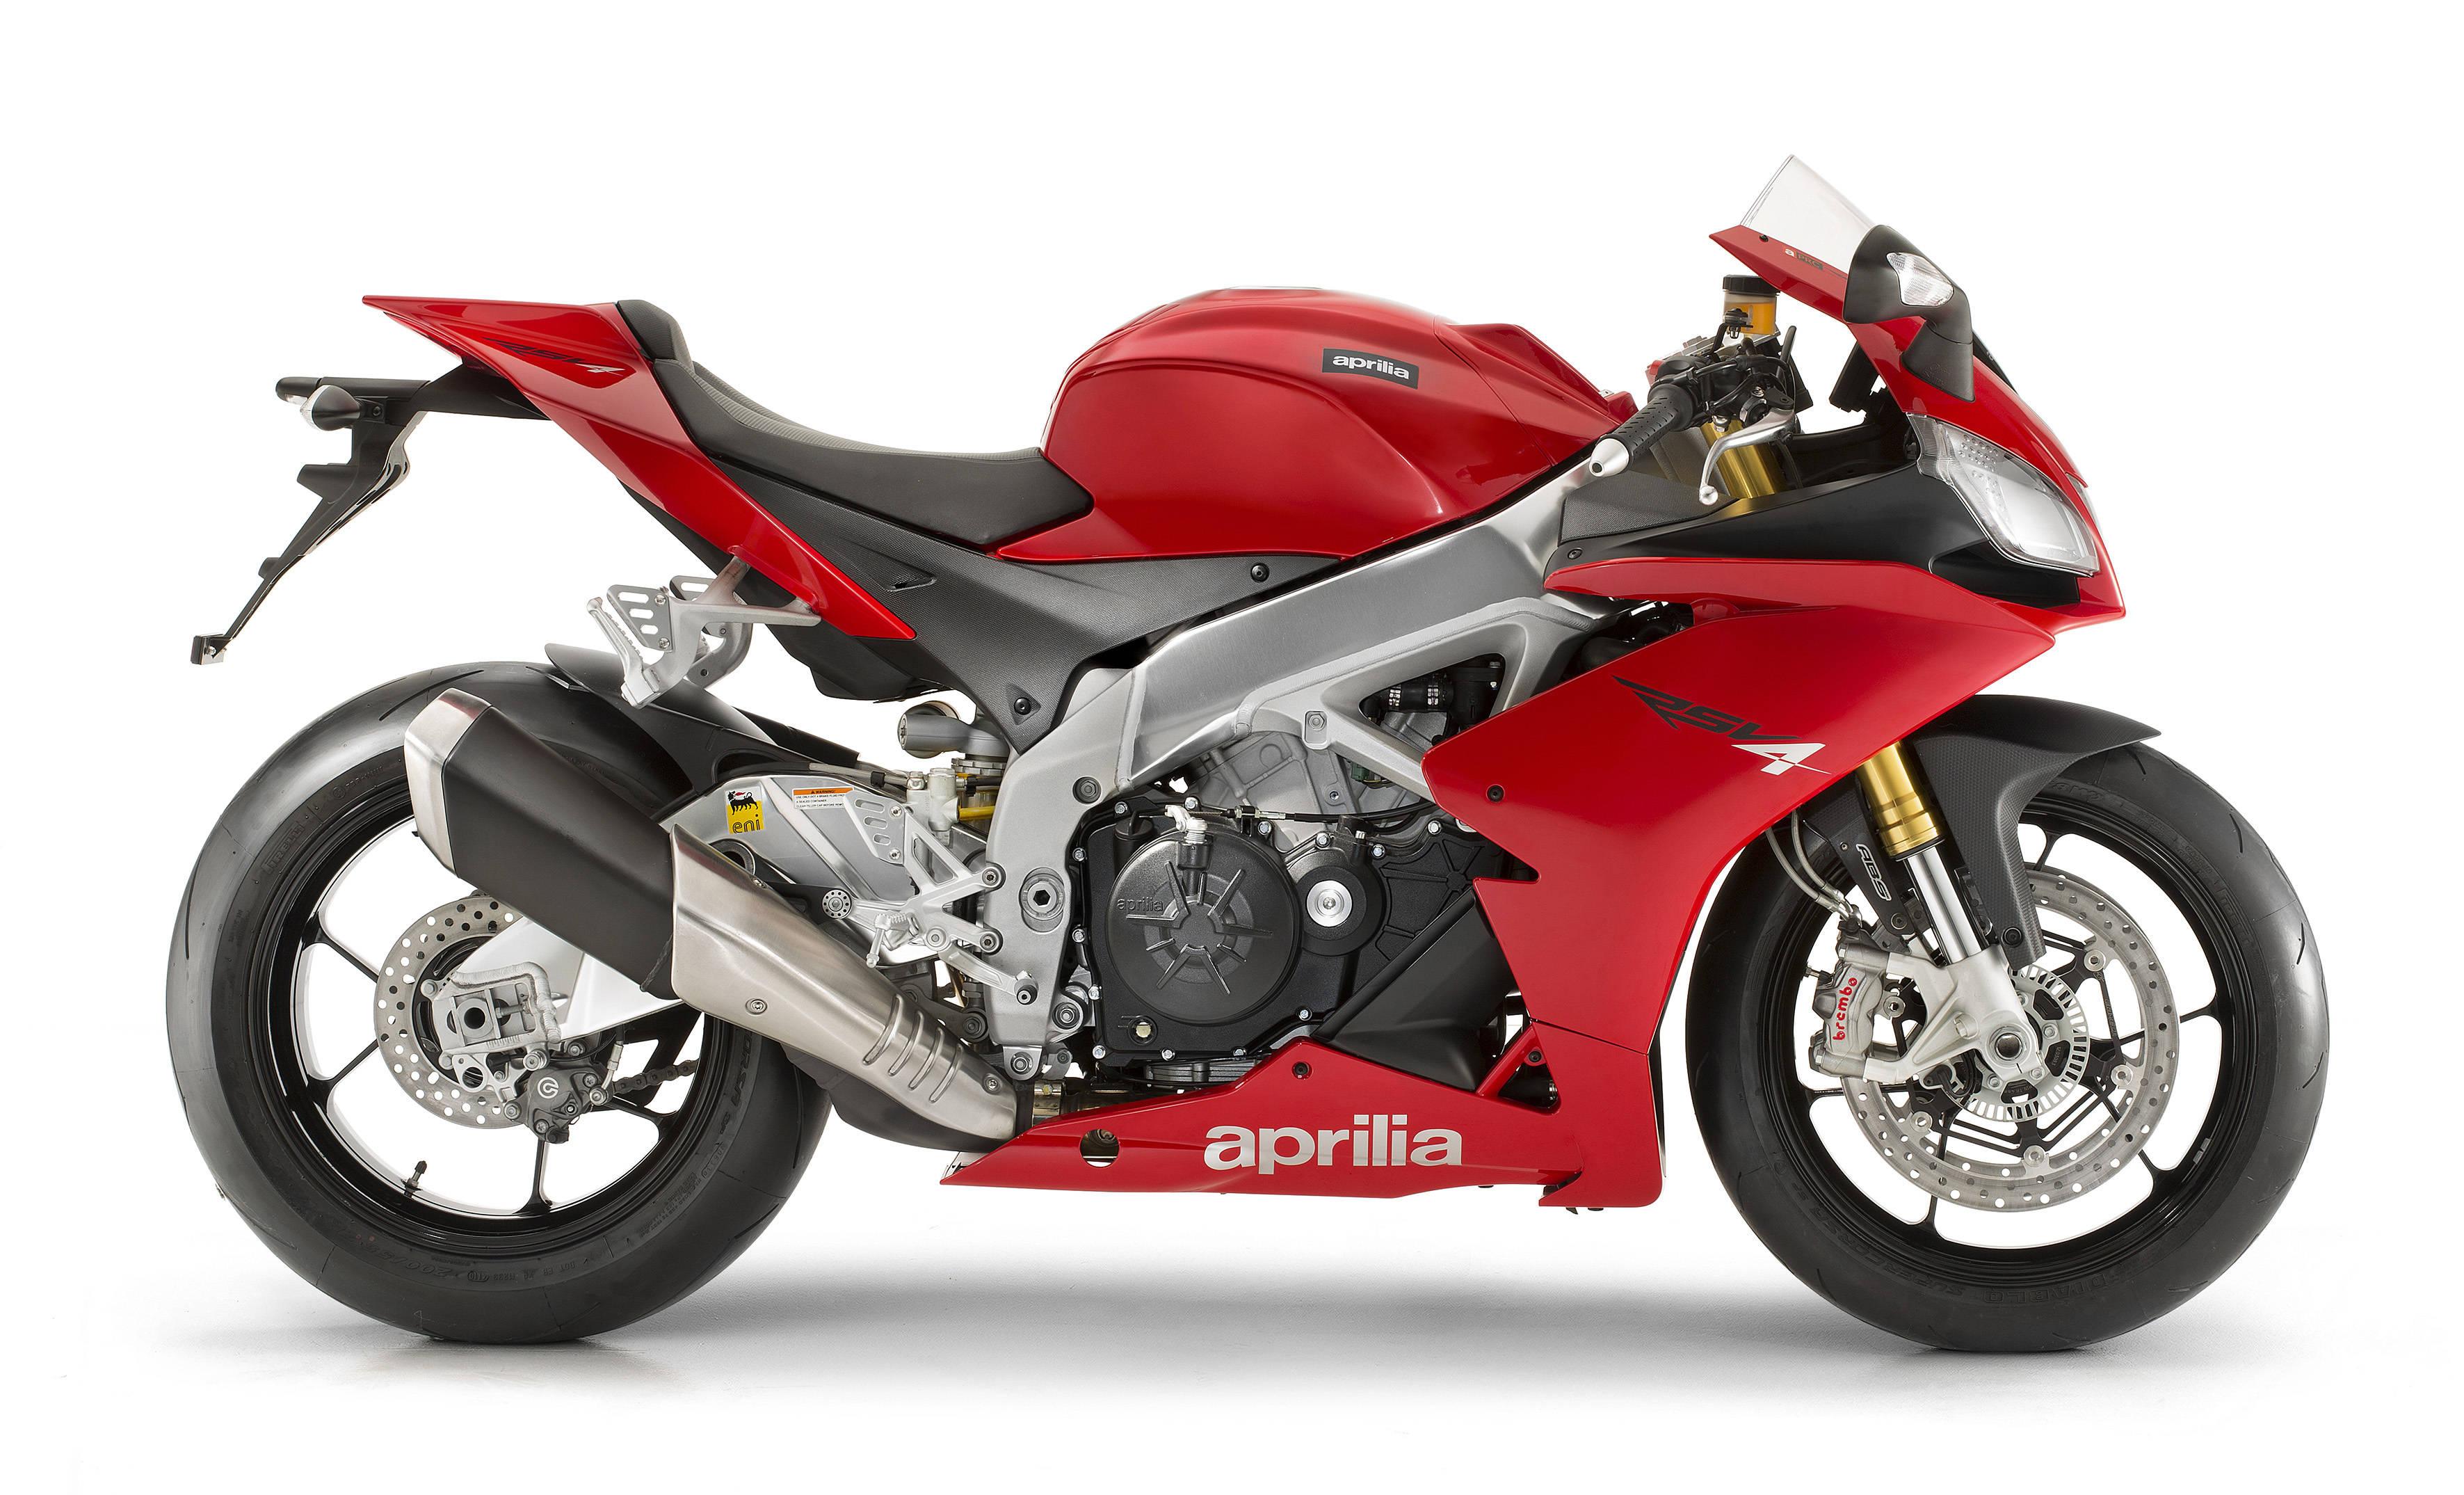 Aprilia Rsv4 Price Mileage Review Aprilia Bikes